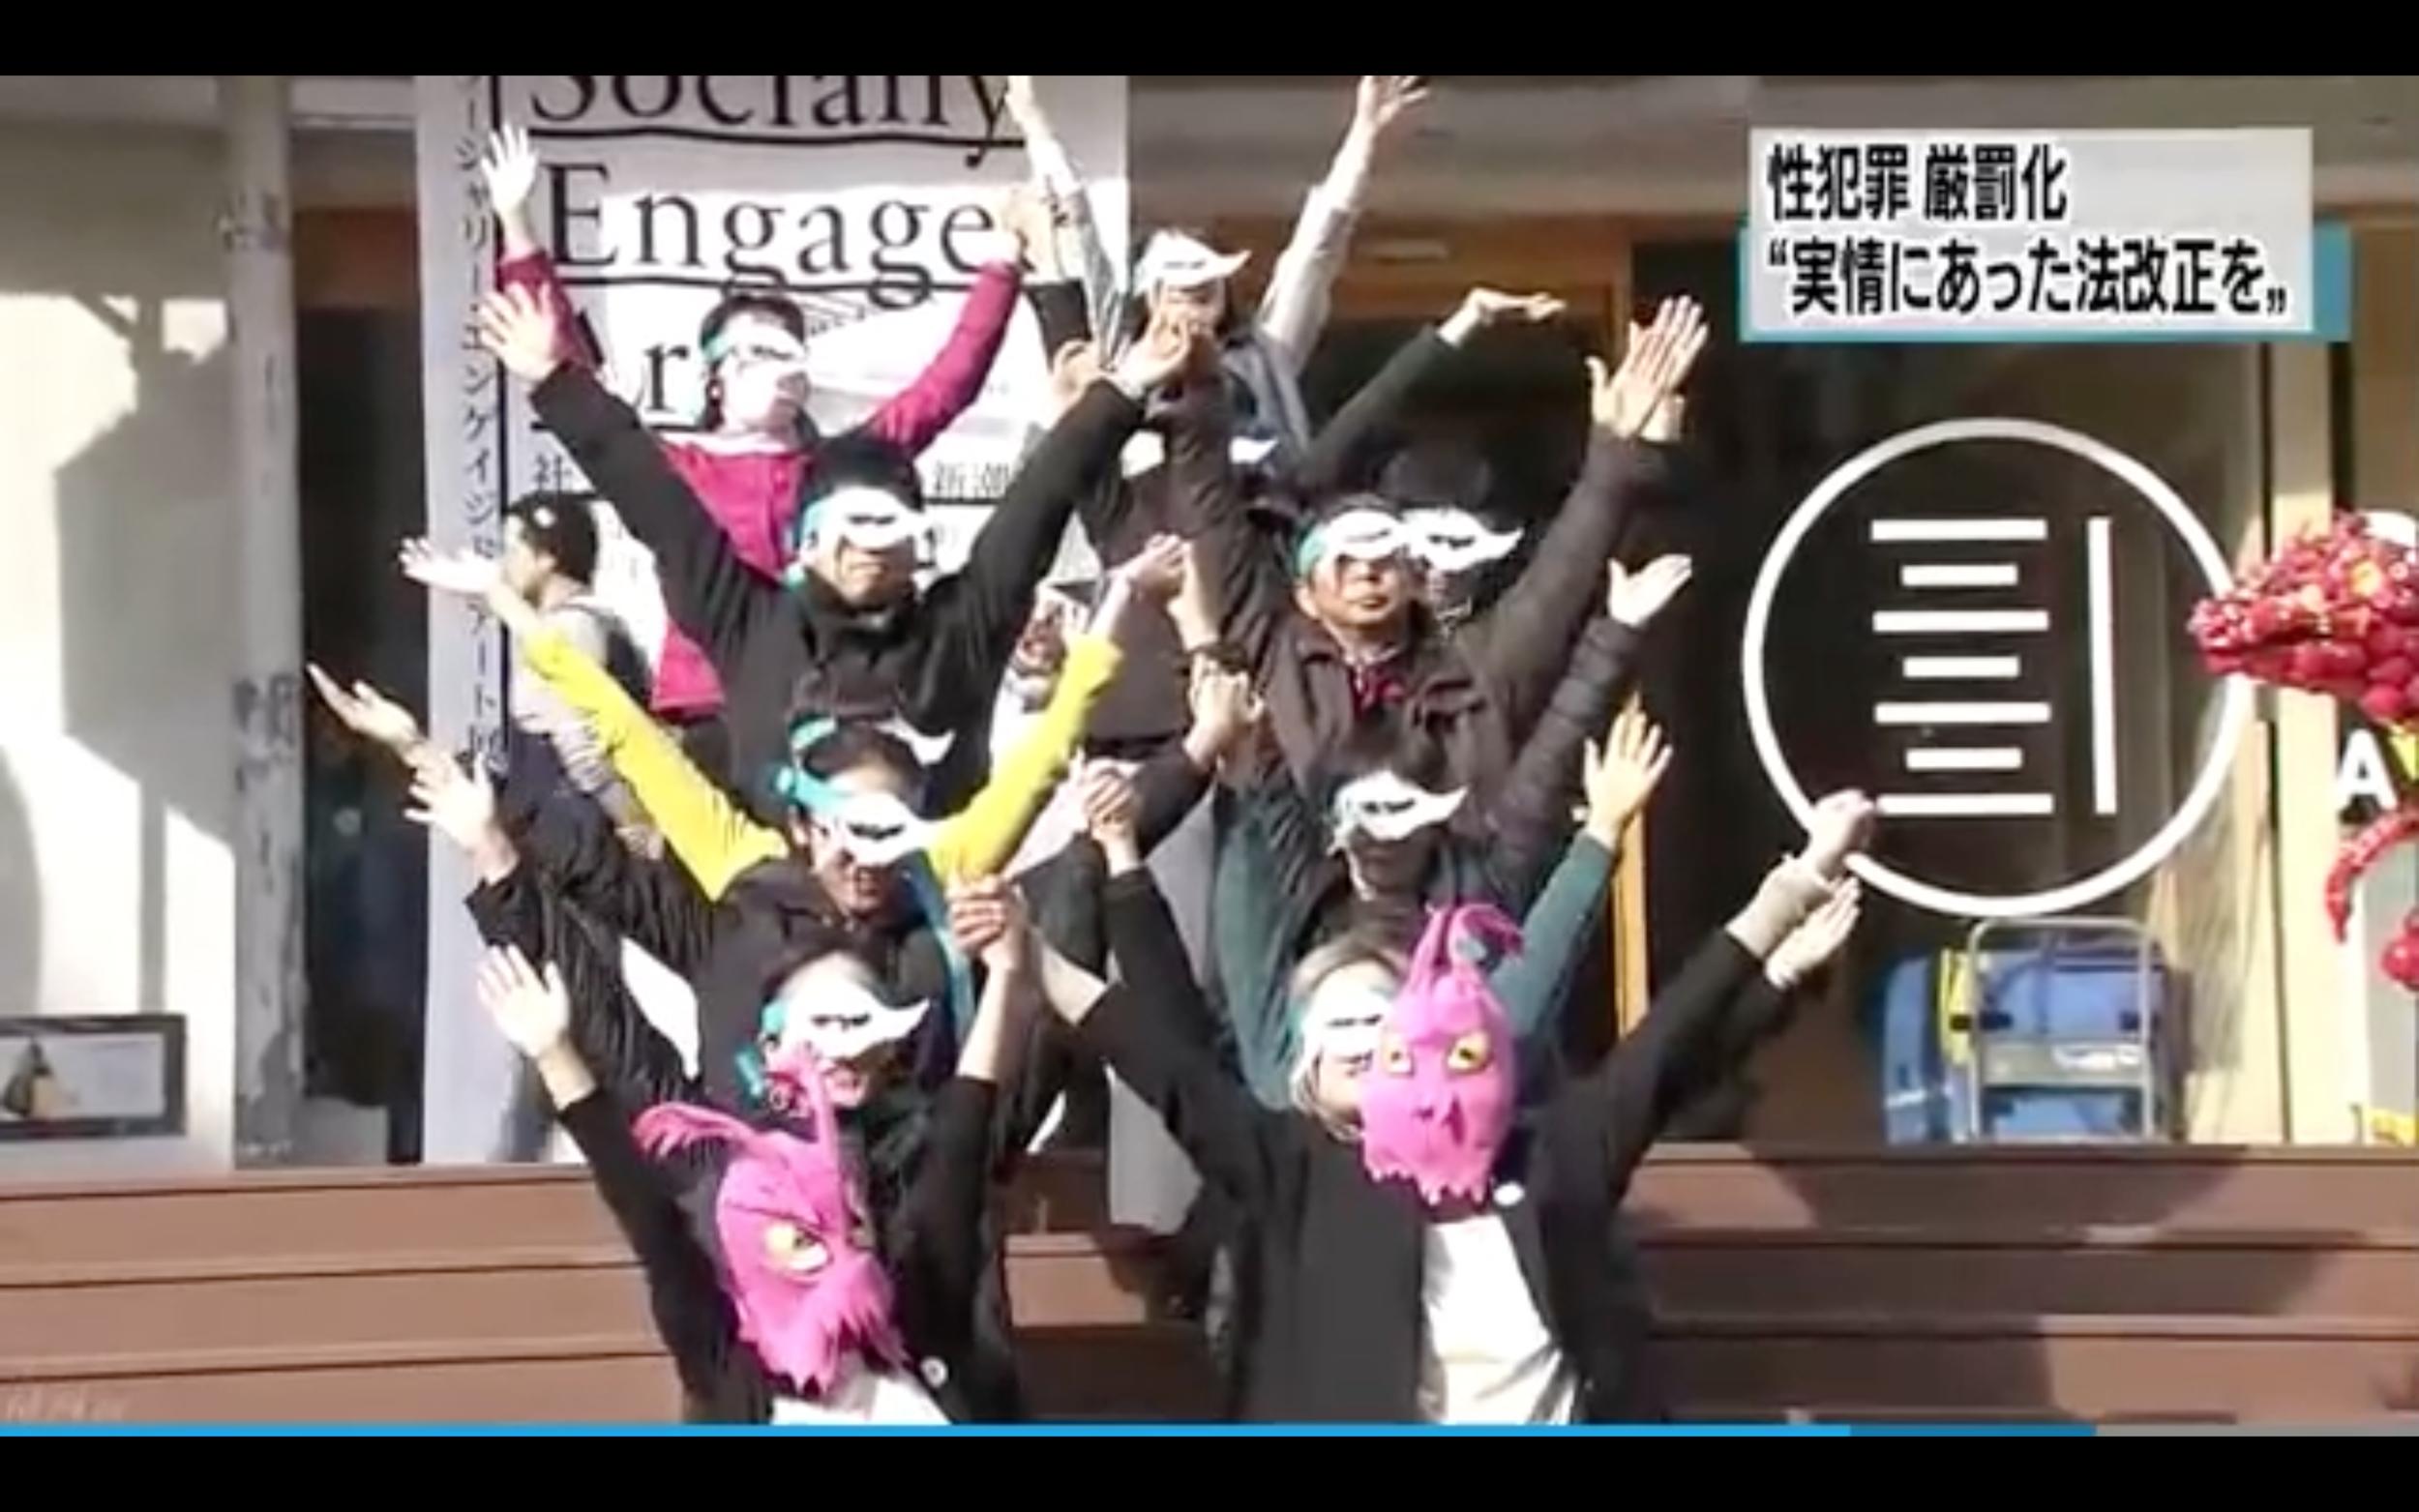 NHKニュース2017.2.26ビリーブマーチ&トーク